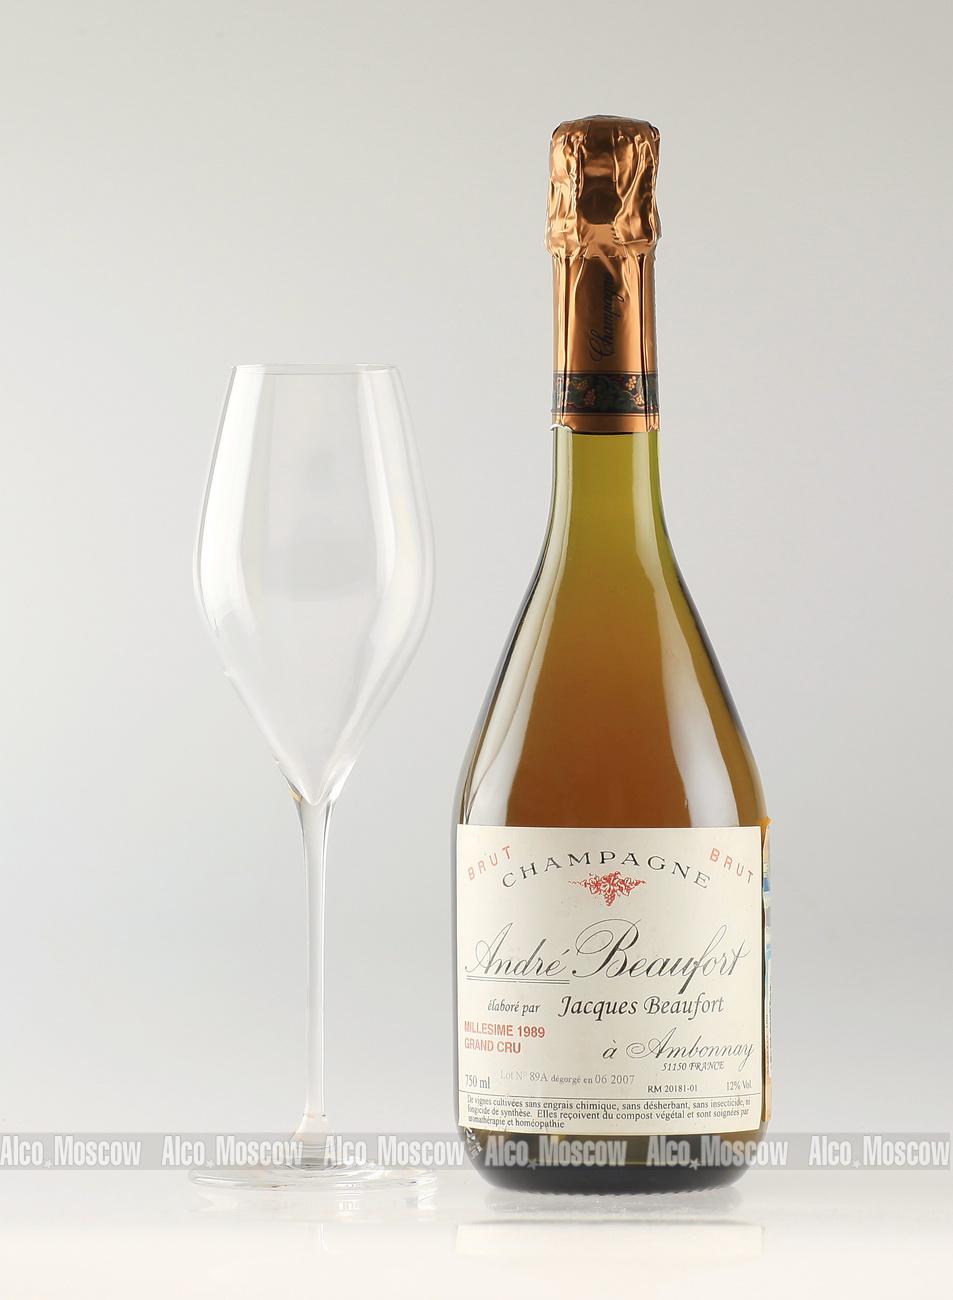 Andre Beaufort Andre Beaufort Brut 1989 шампанское Андре Буфор Брют 1989 года